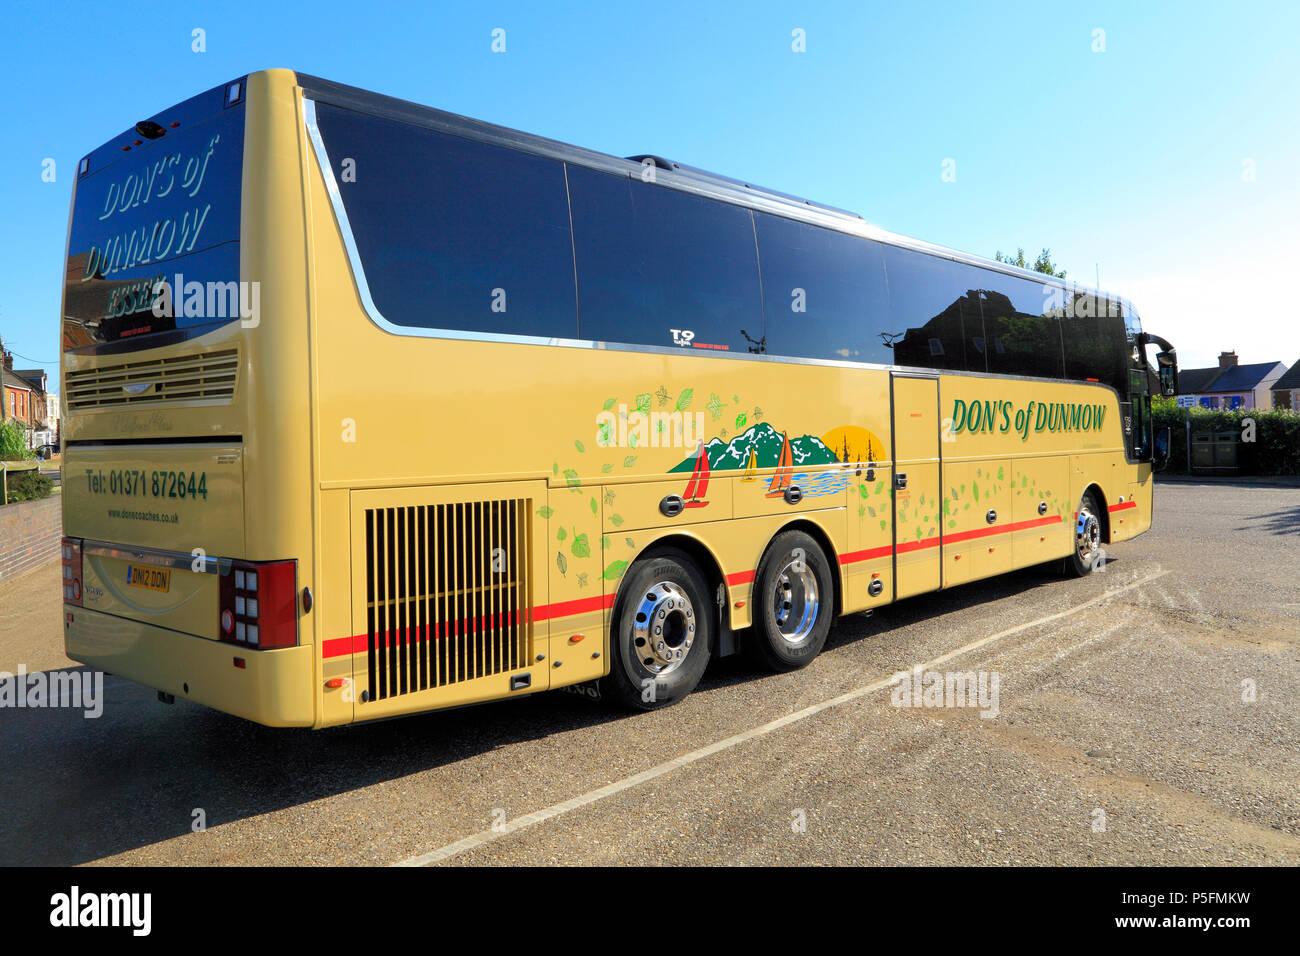 Don's de Dunmow, autocar, bus, transport, England, UK Photo Stock